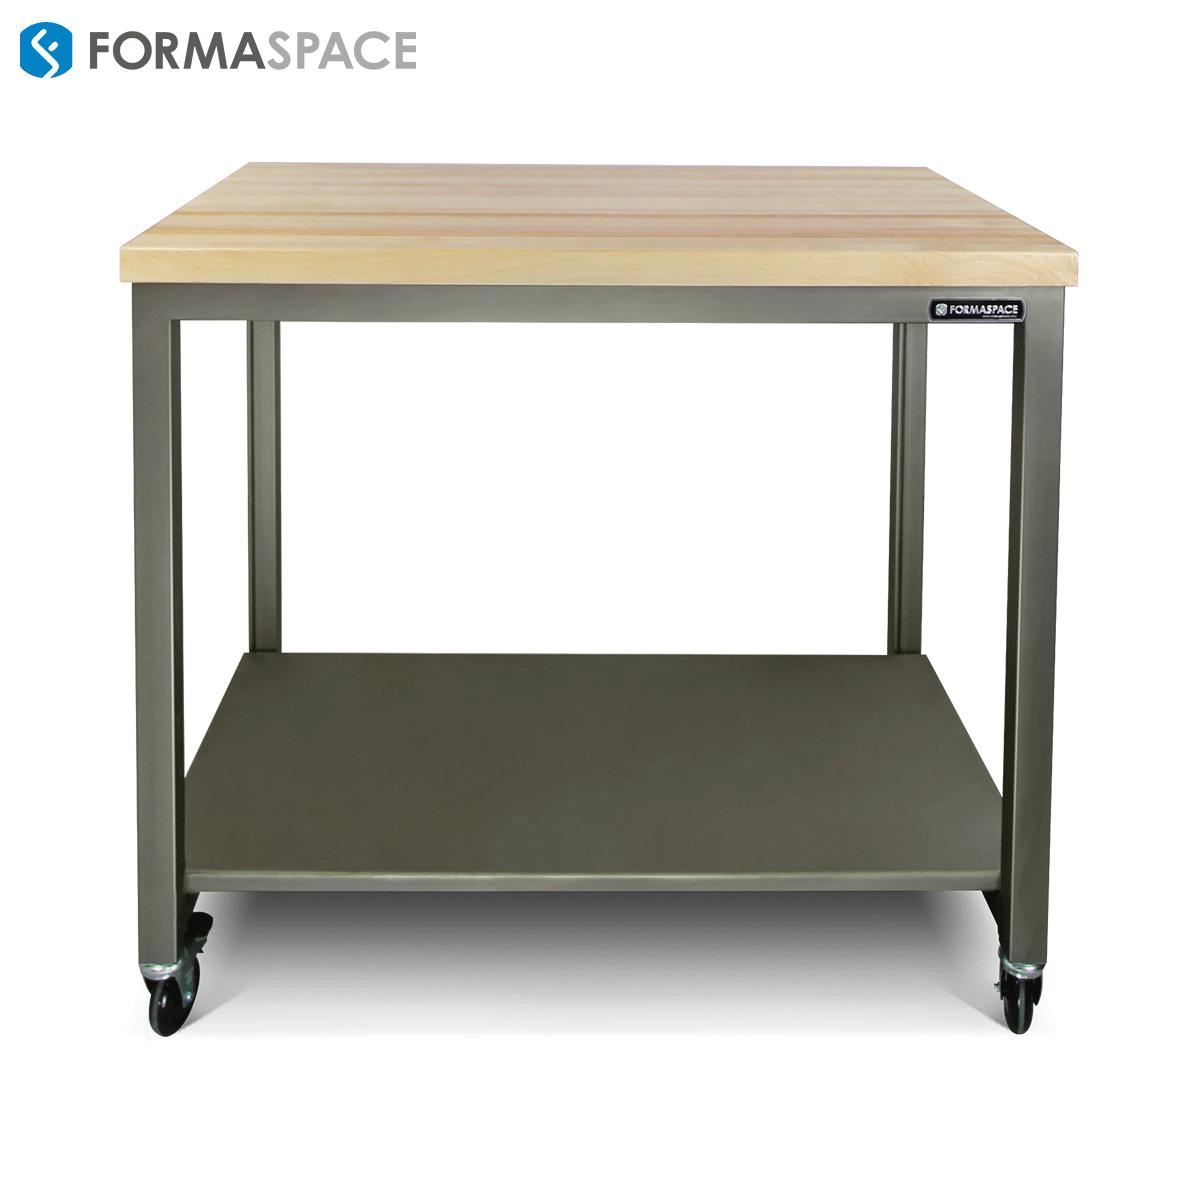 Brilliant Basix With Steel Lower Shelf Formaspace This Standard Machost Co Dining Chair Design Ideas Machostcouk